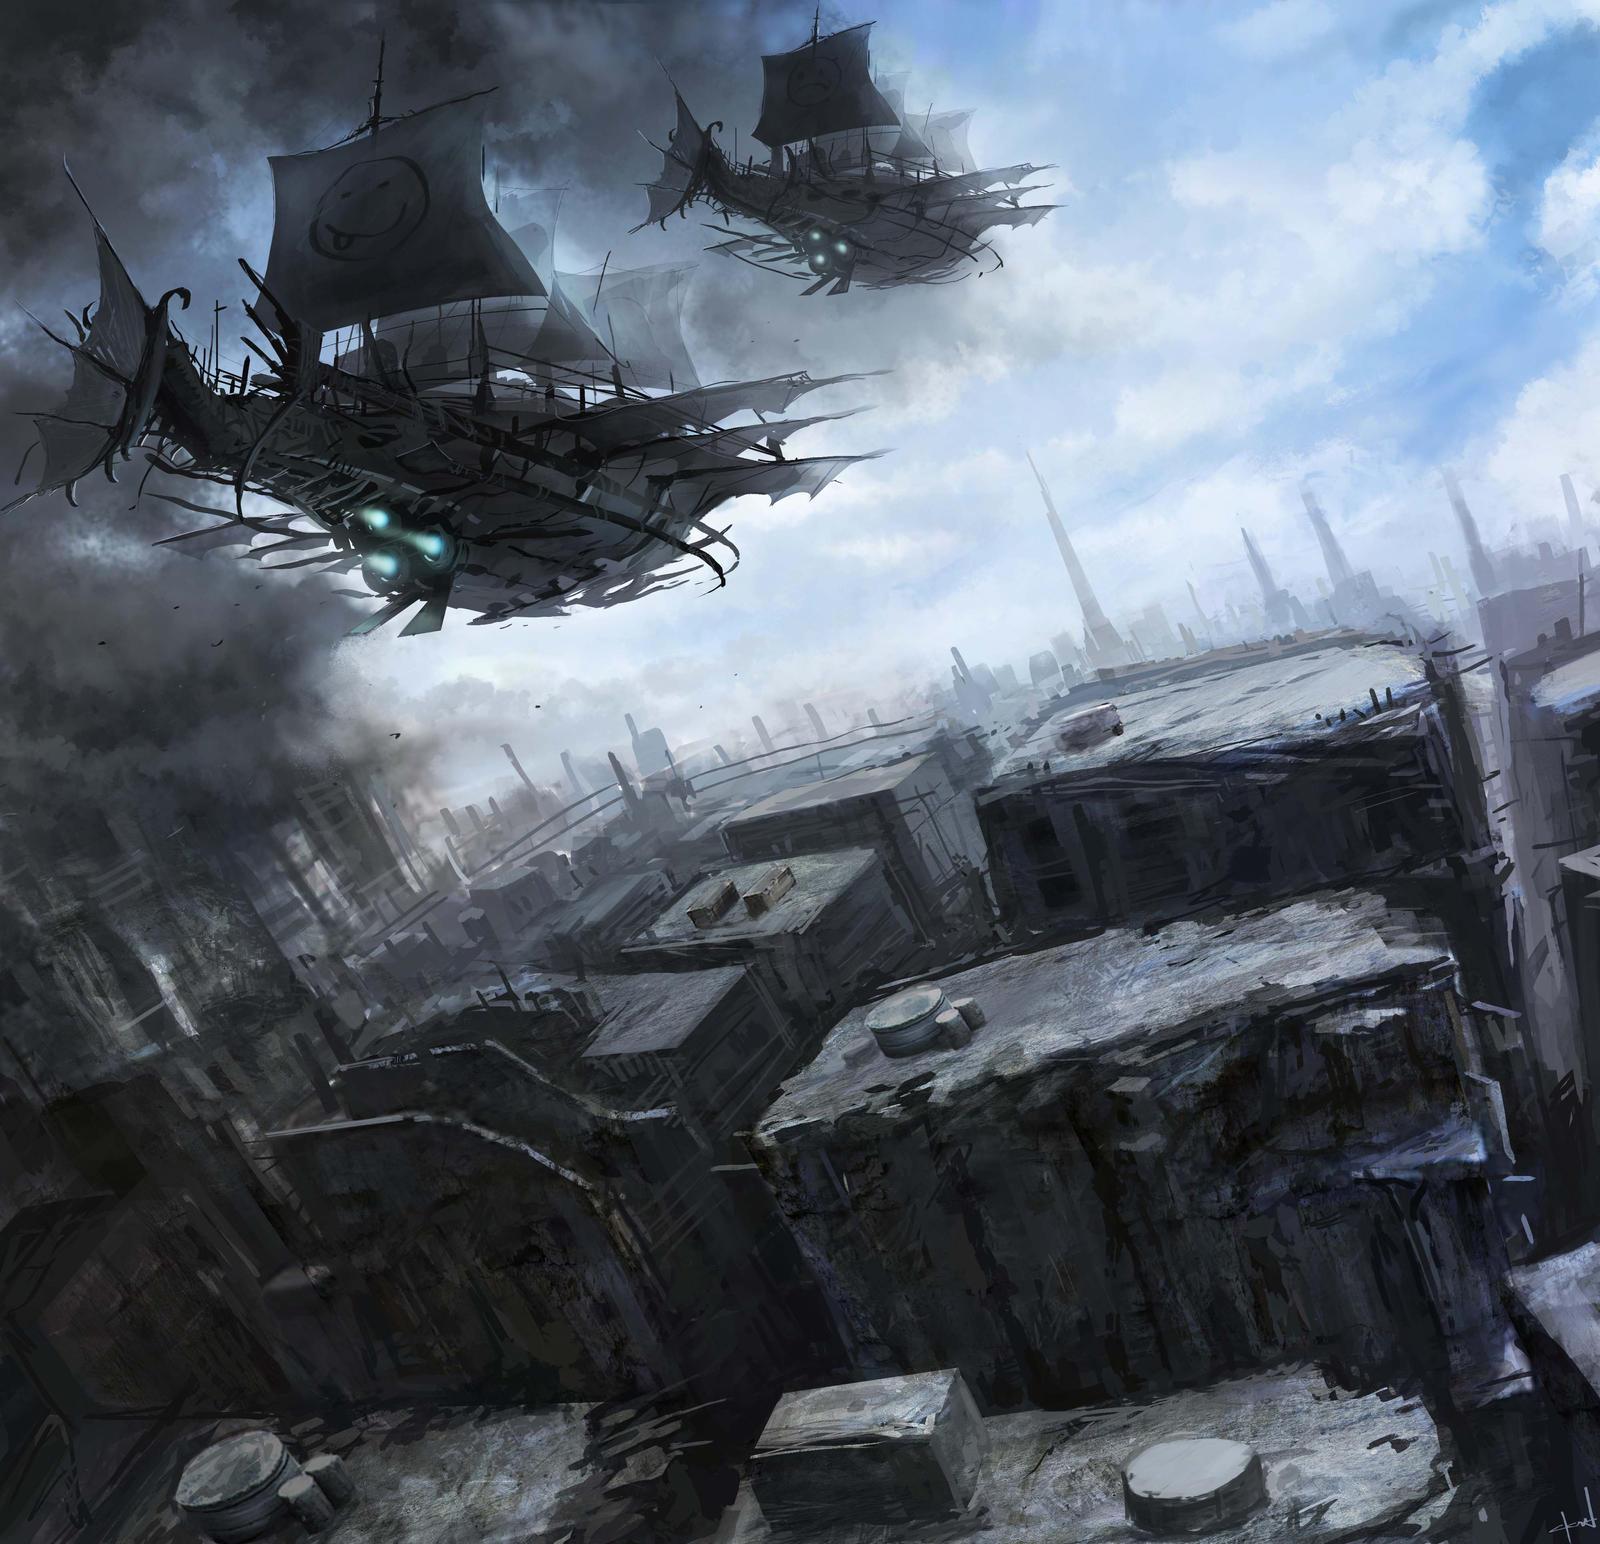 Space Pirates by Darkcloud013